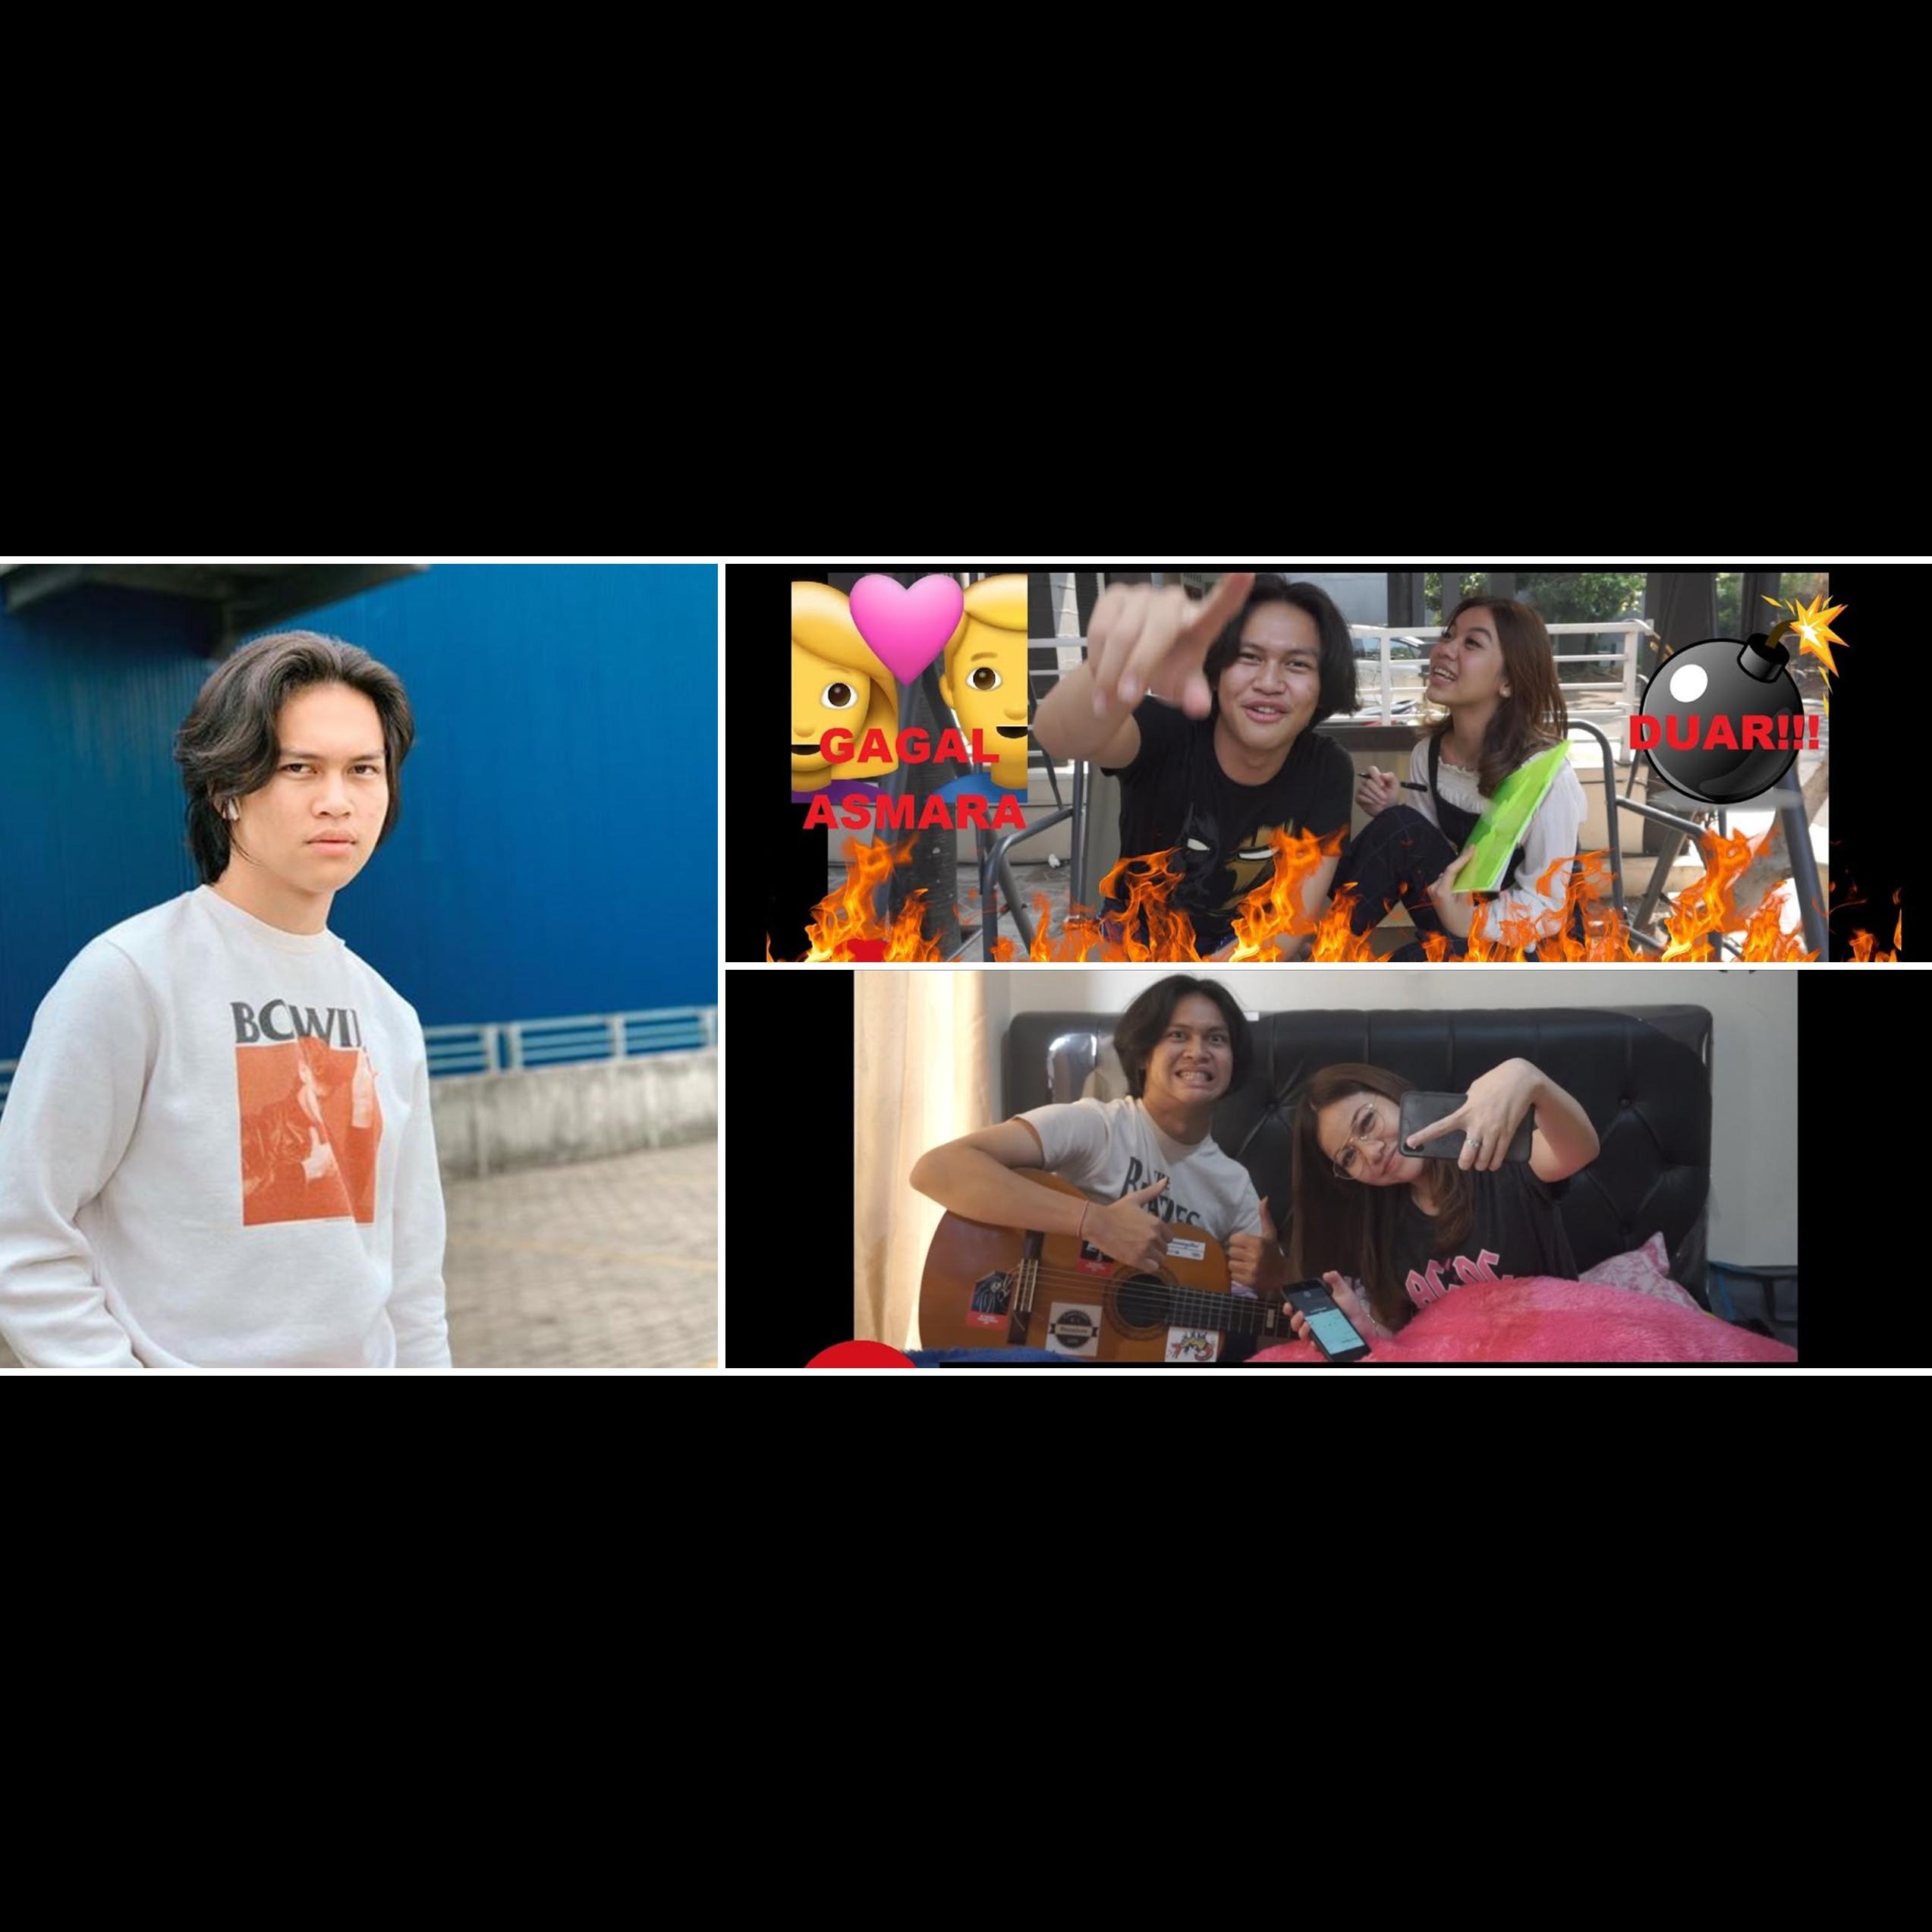 5 Momen kompak YouTuber Fahsya Attaramzi & kakak yang indigo